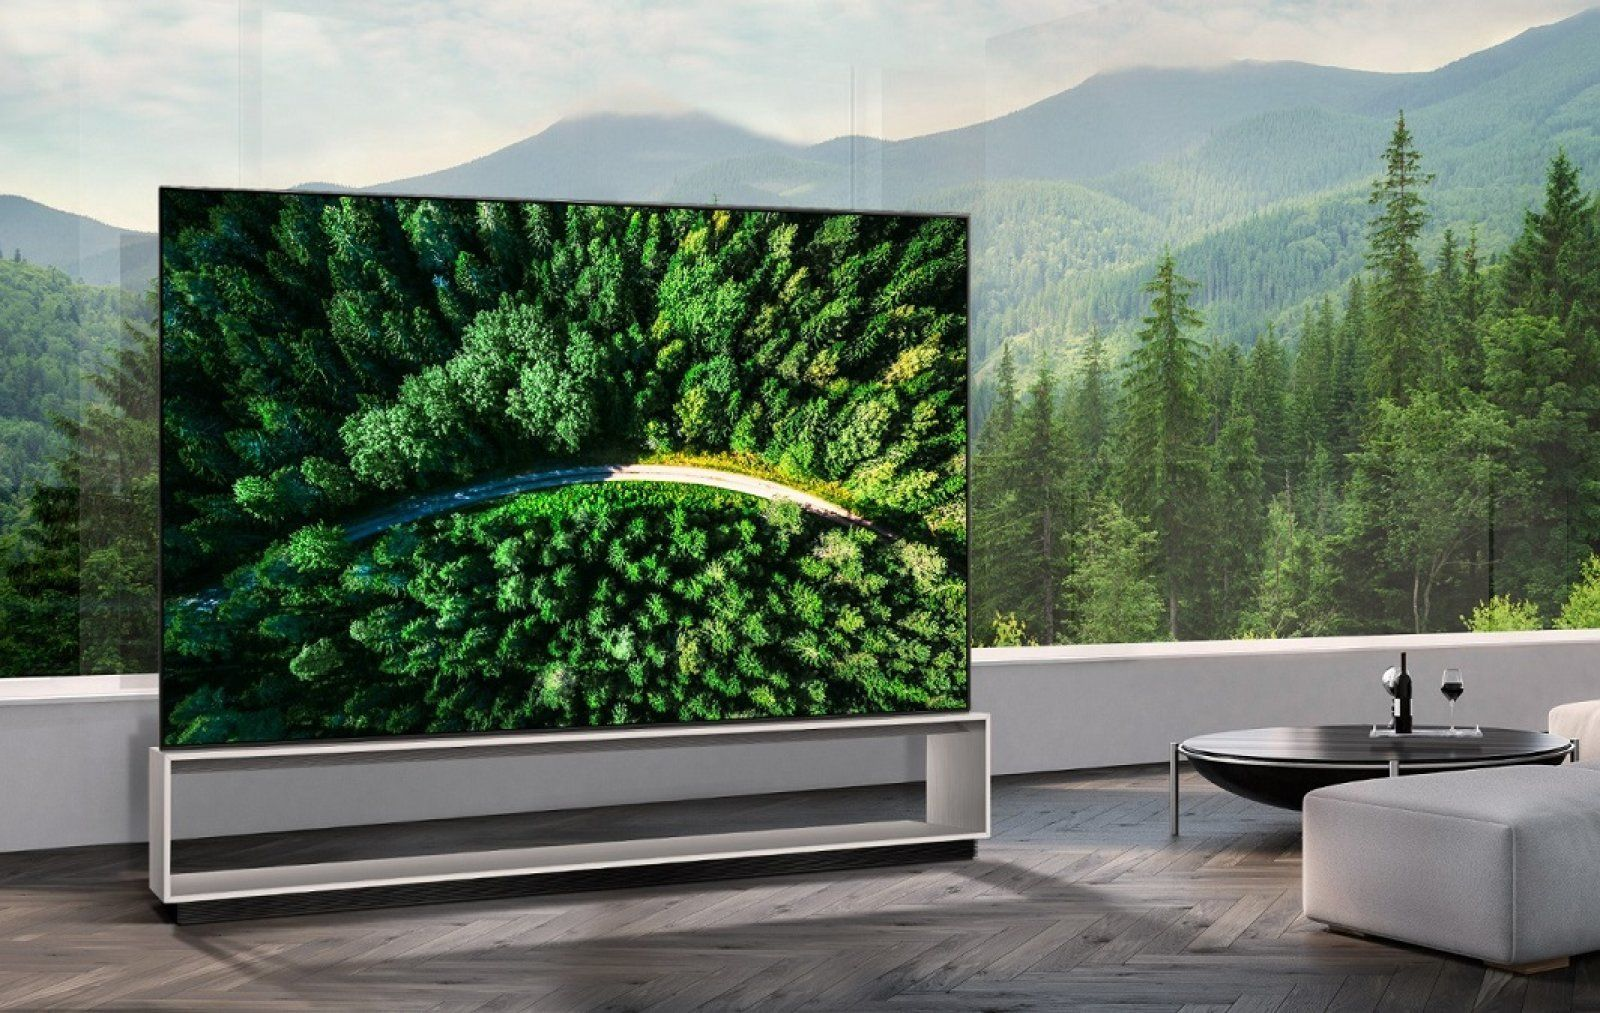 LG的88英寸8K OLED电视正式上市